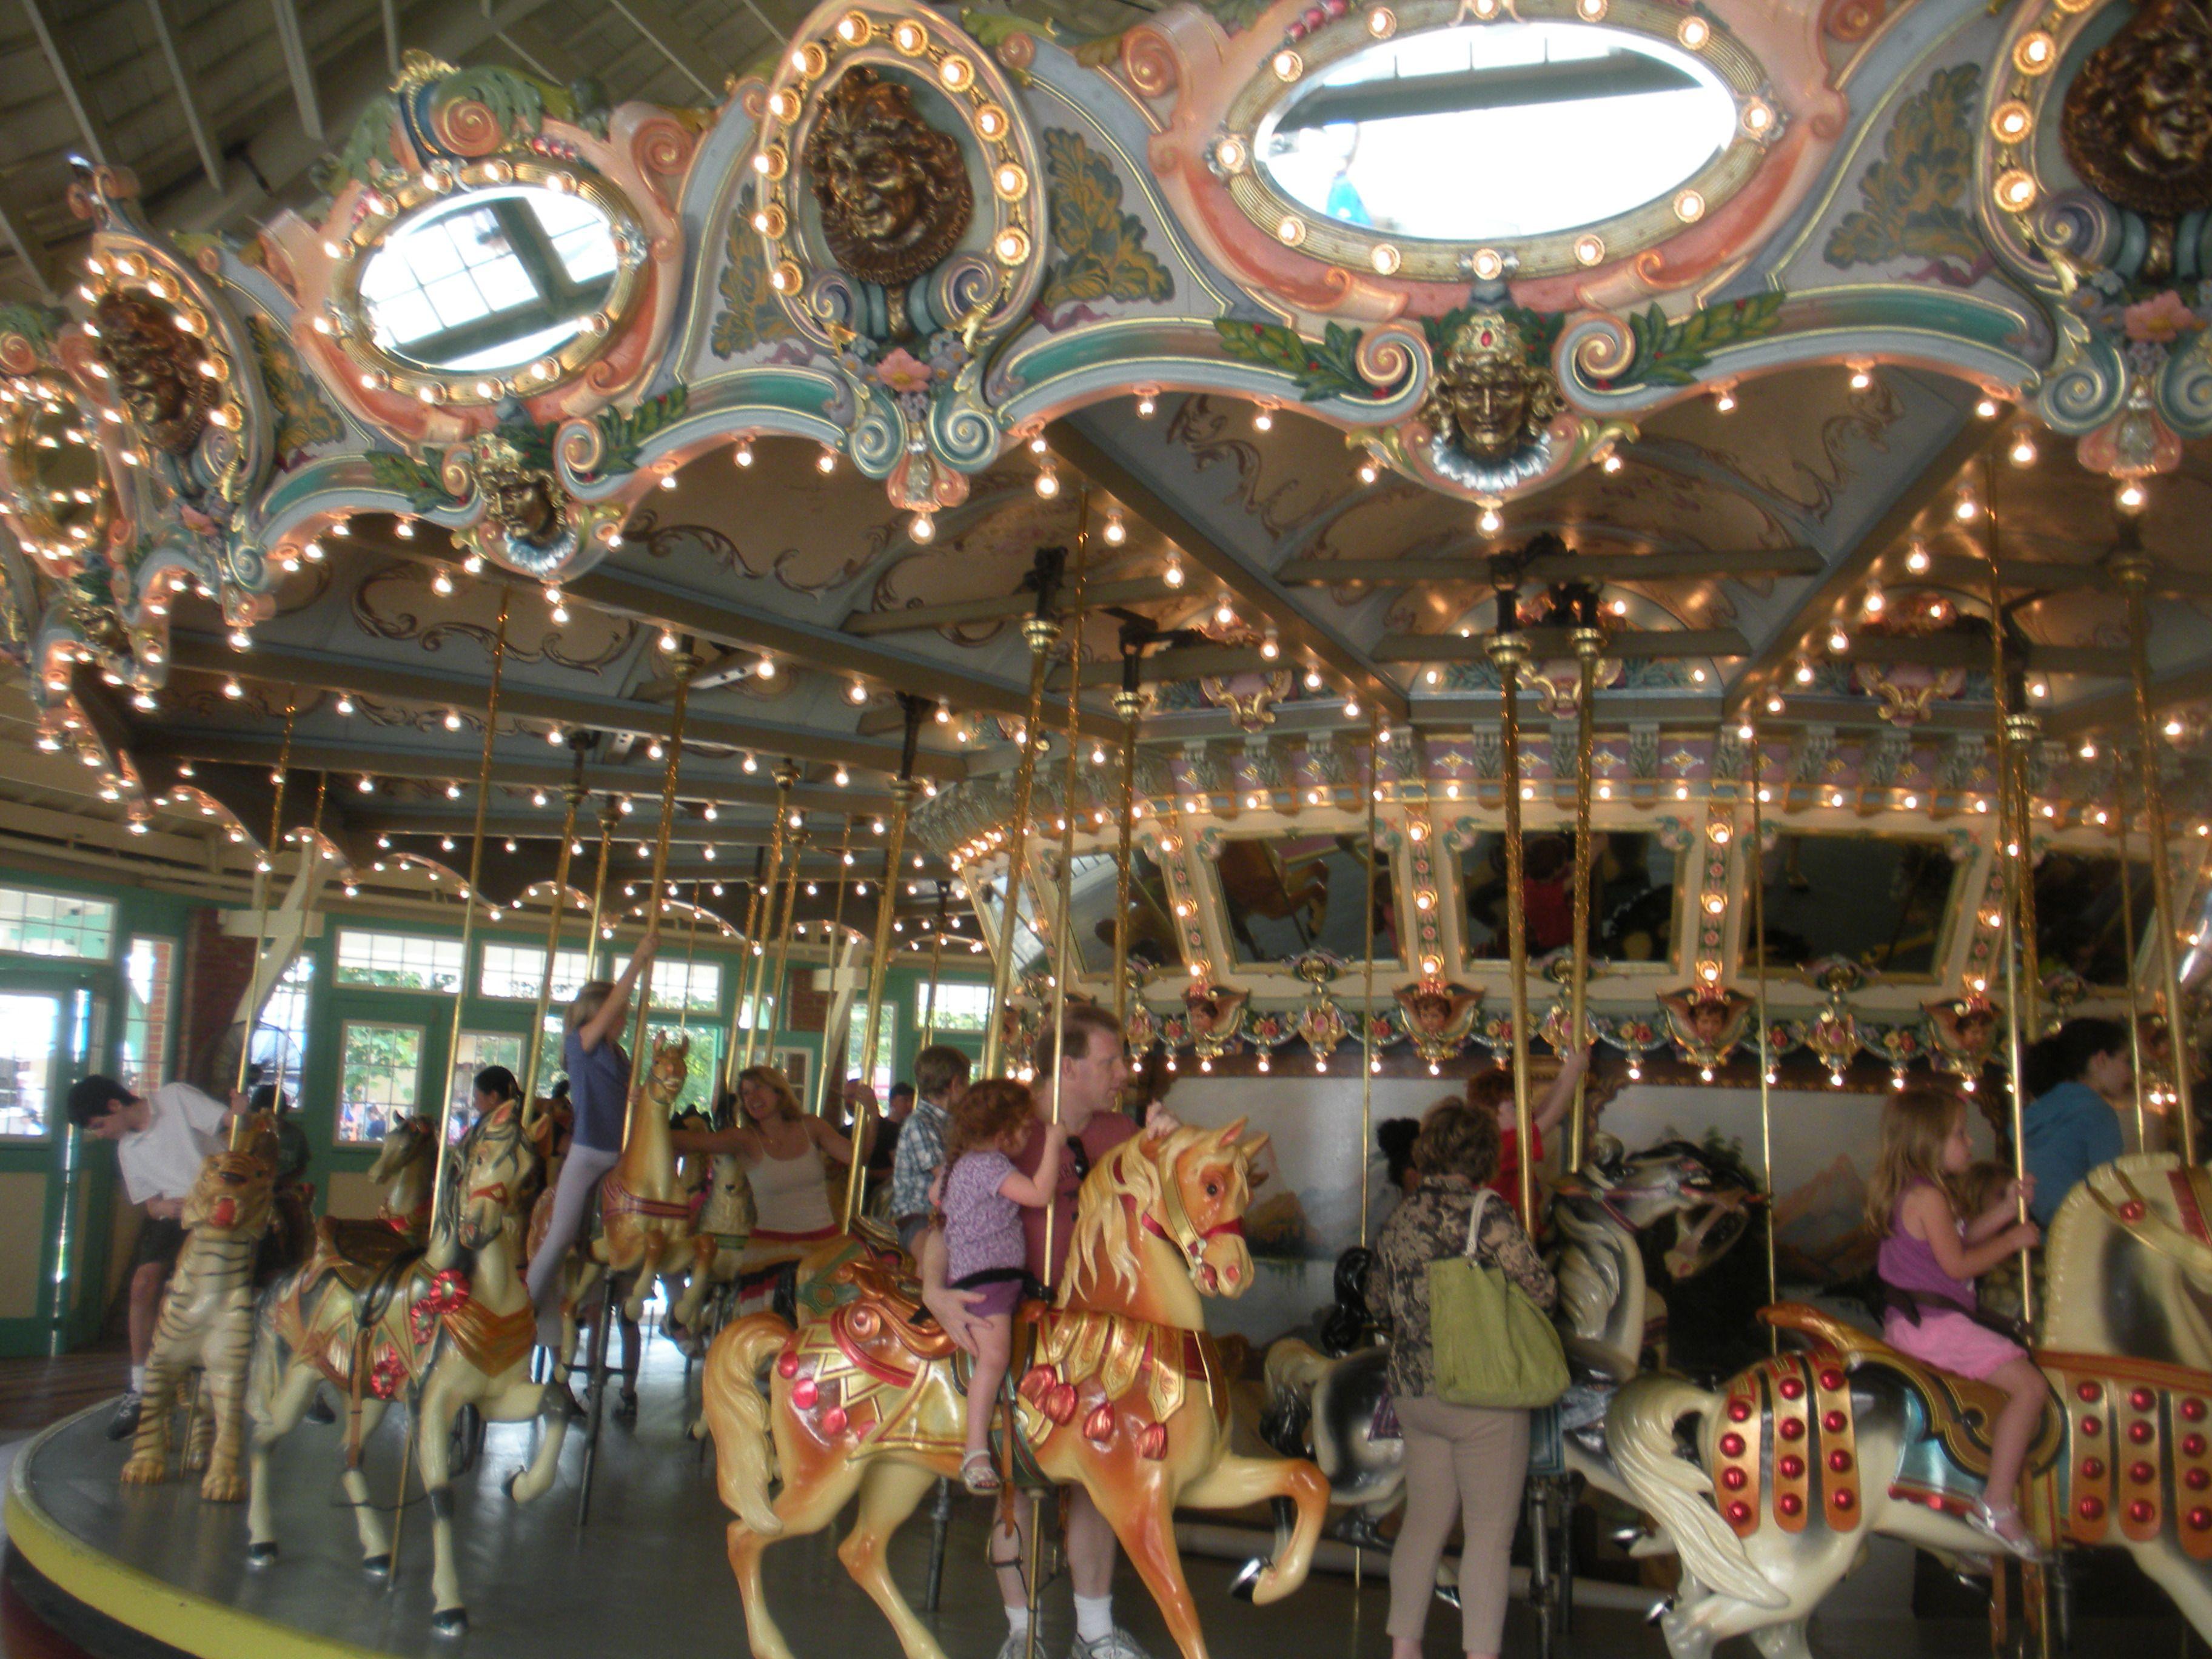 Carousels This one is in Glen Echo, Maryland Glen echo